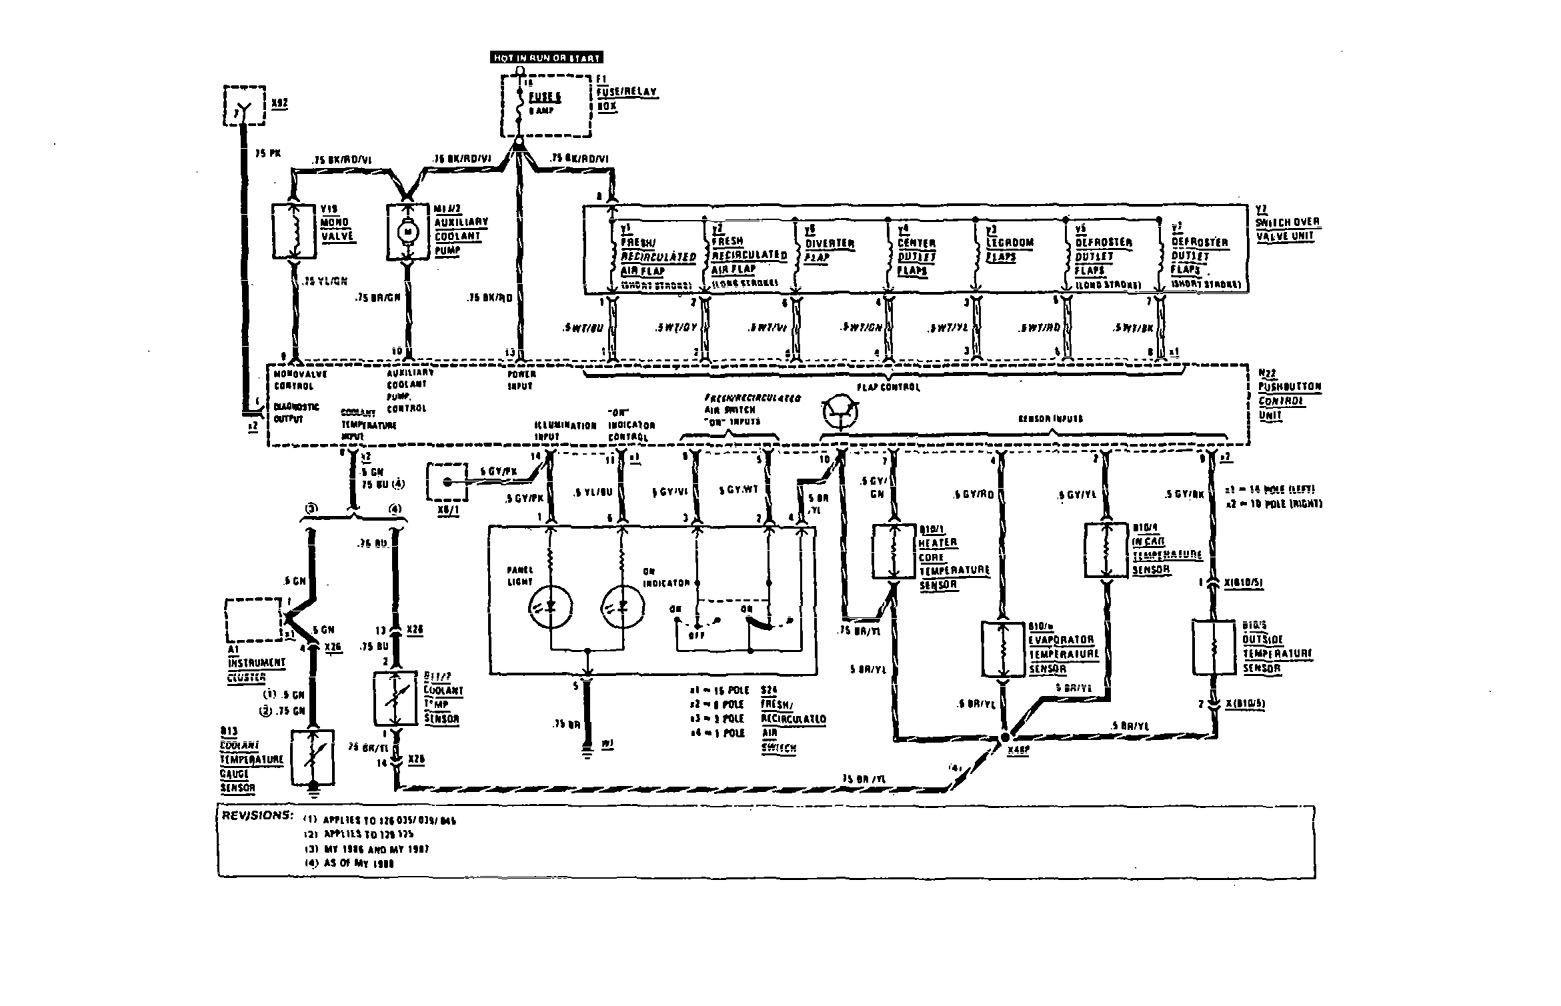 [DIAGRAM] 1991 Mercedes E300 Wiring Diagram FULL Version